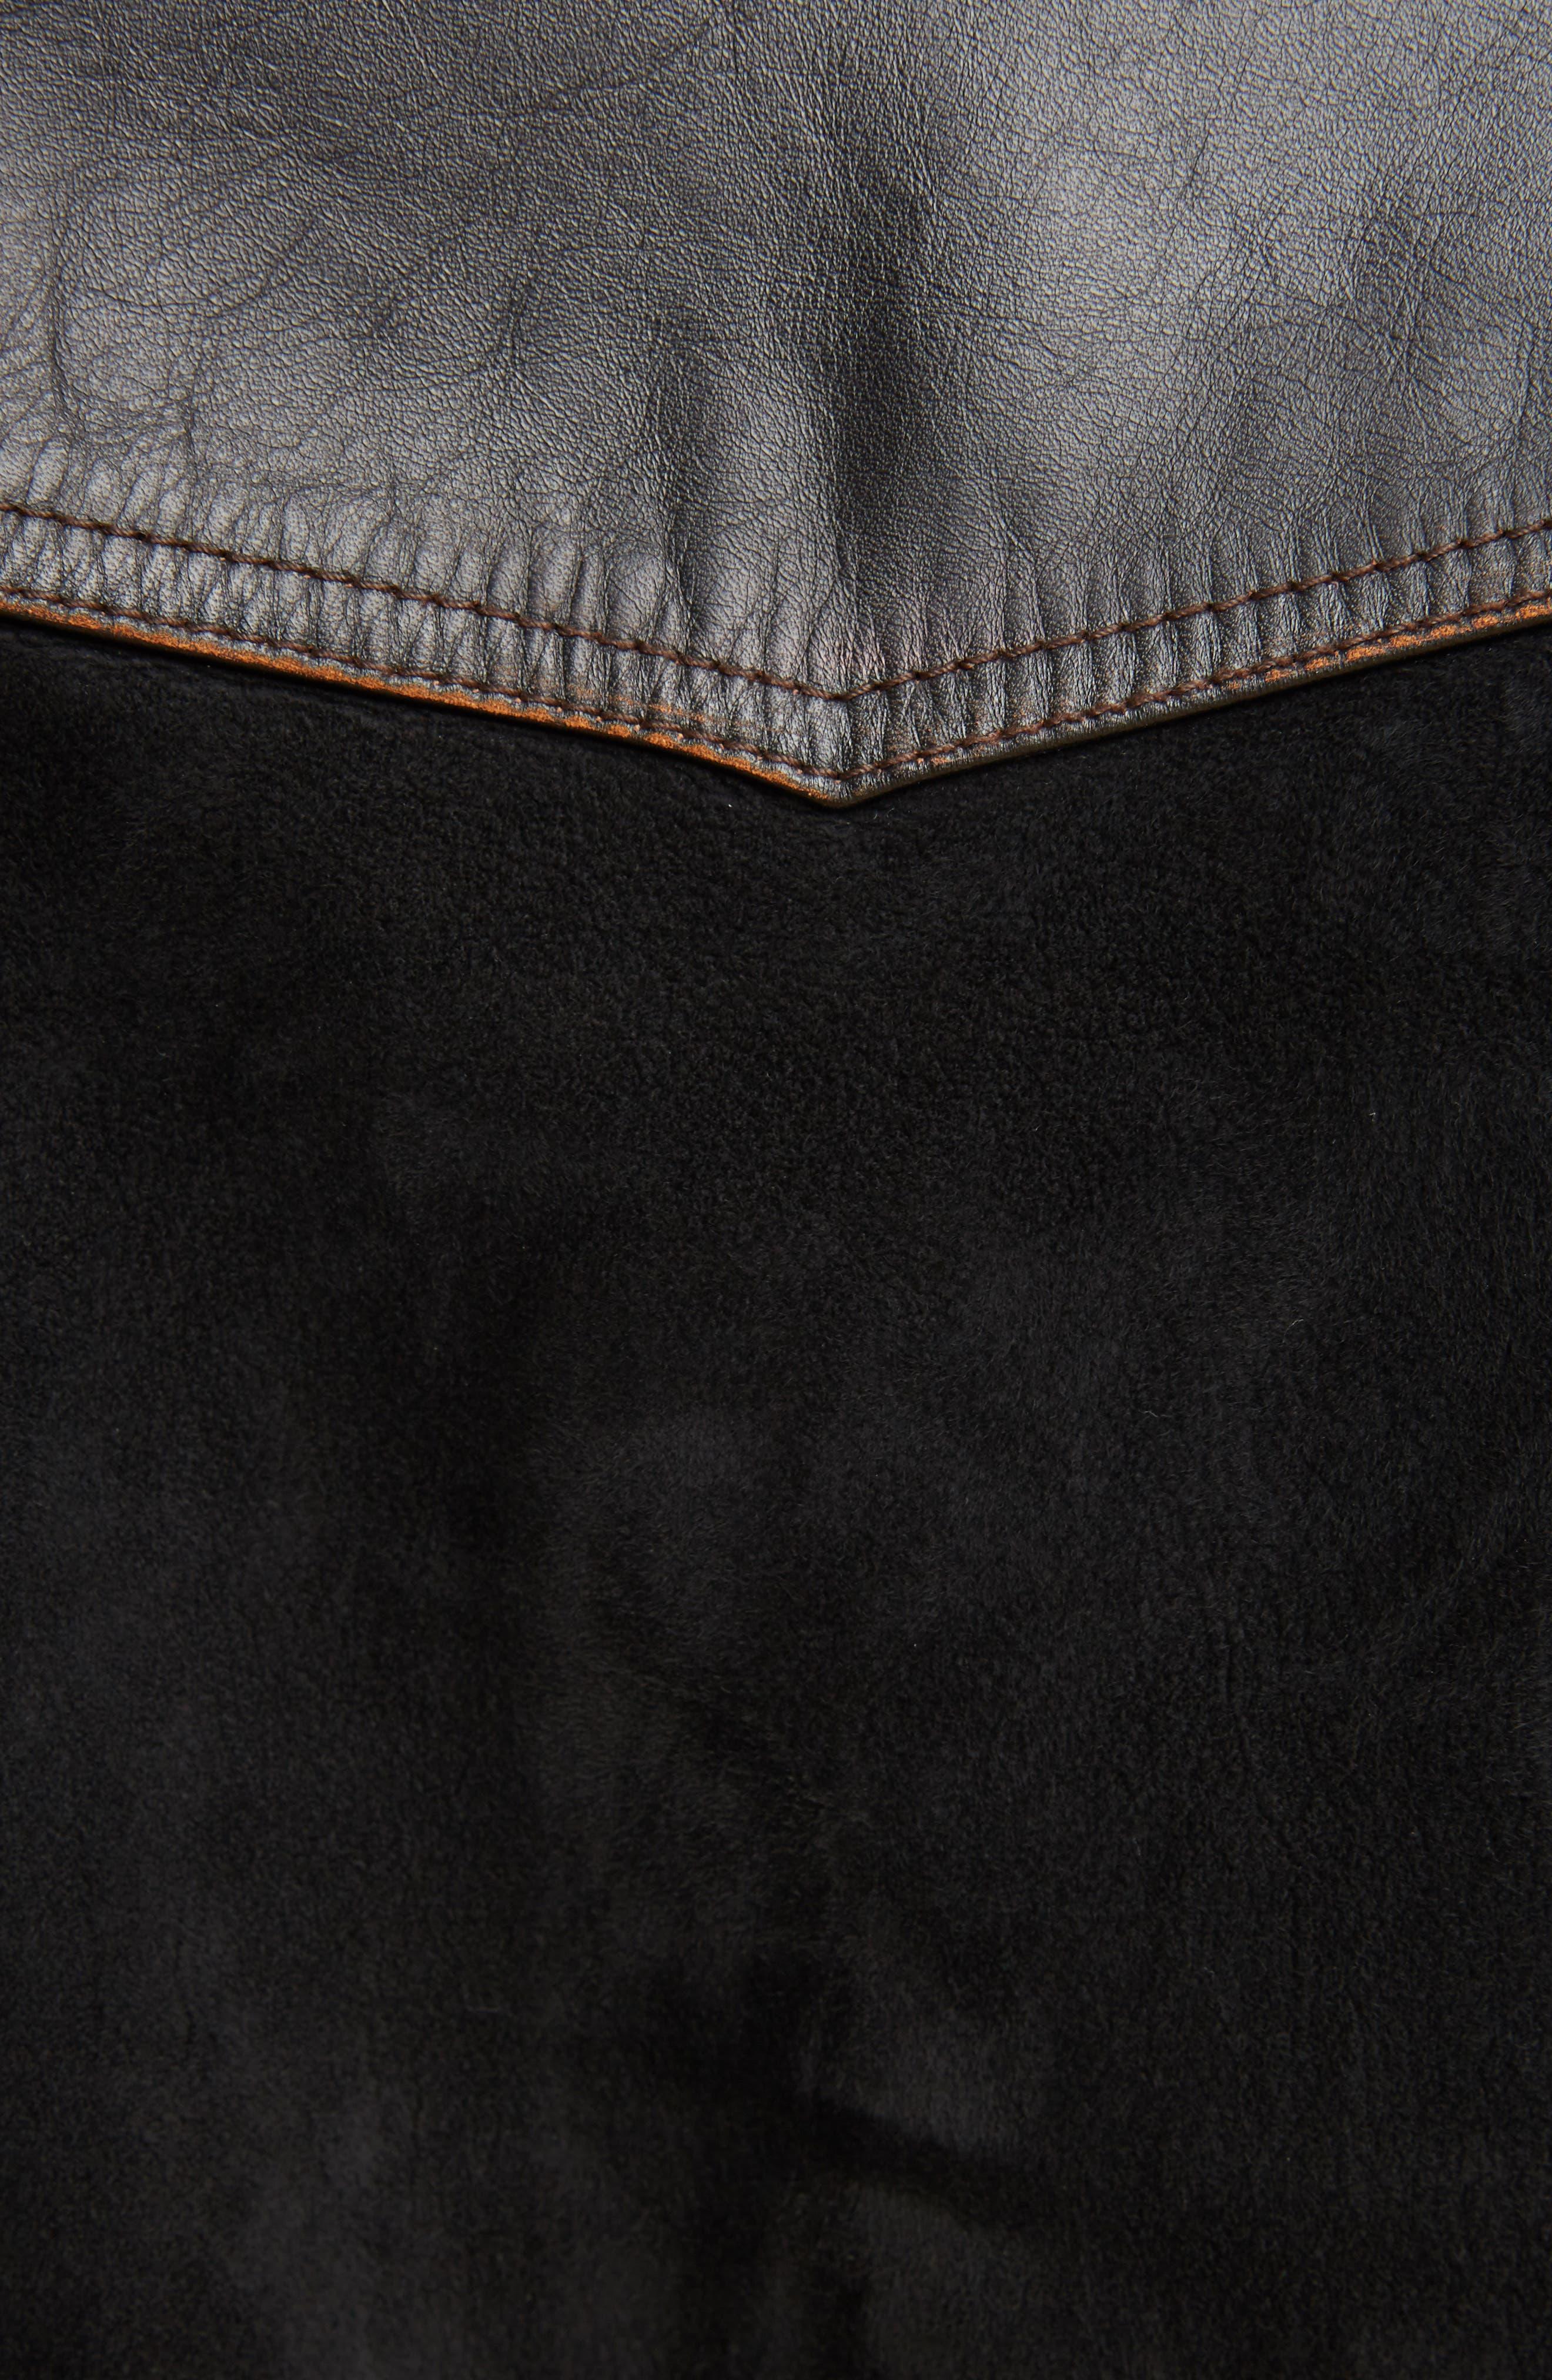 Suede & Leather Bomber Jacket,                             Alternate thumbnail 5, color,                             Black